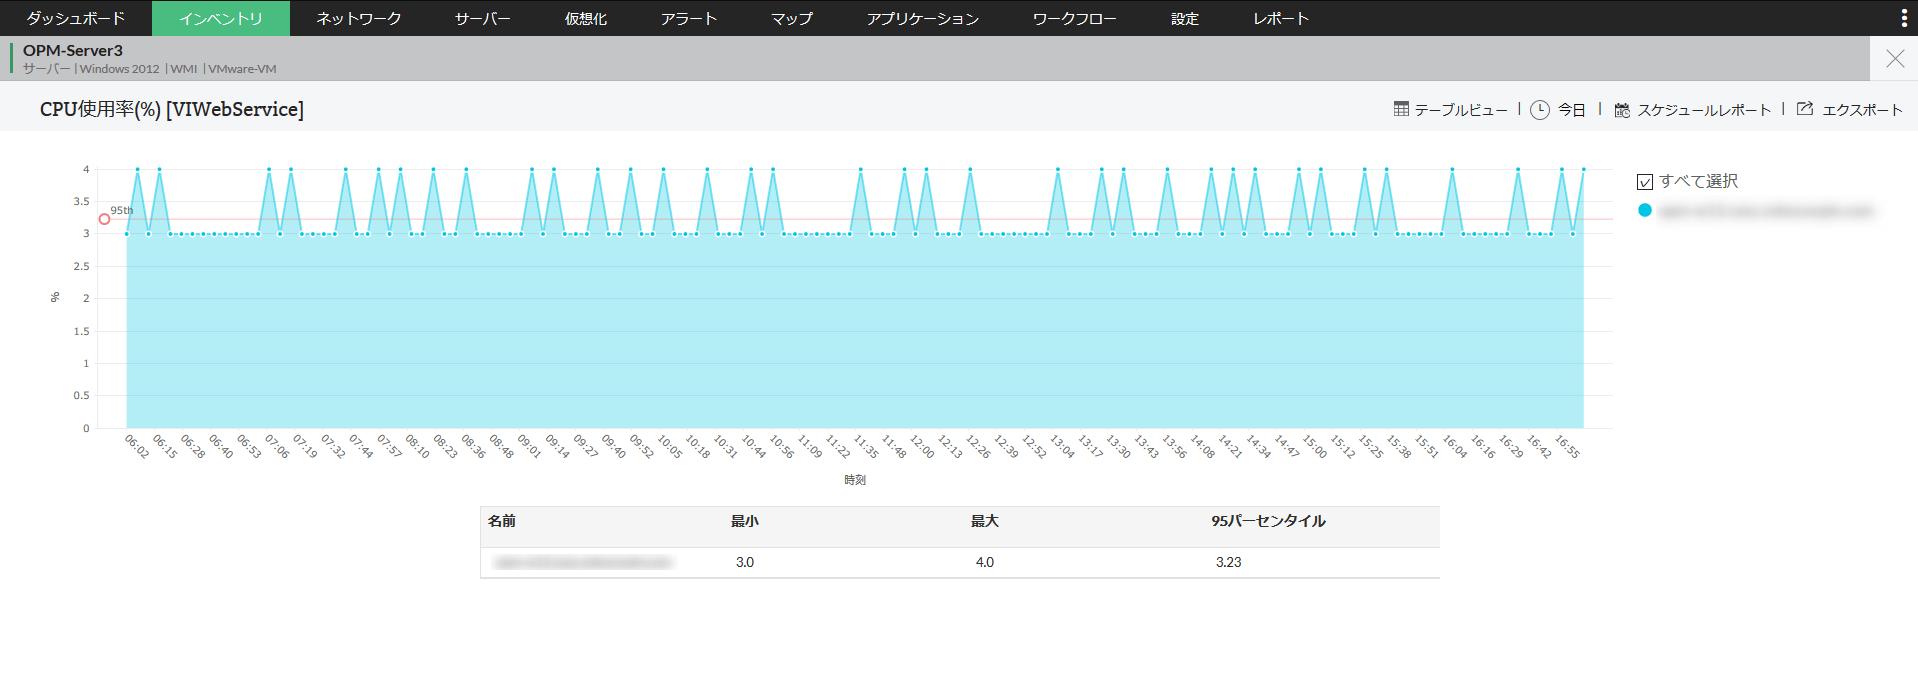 CPU使用率の時系列グラフ